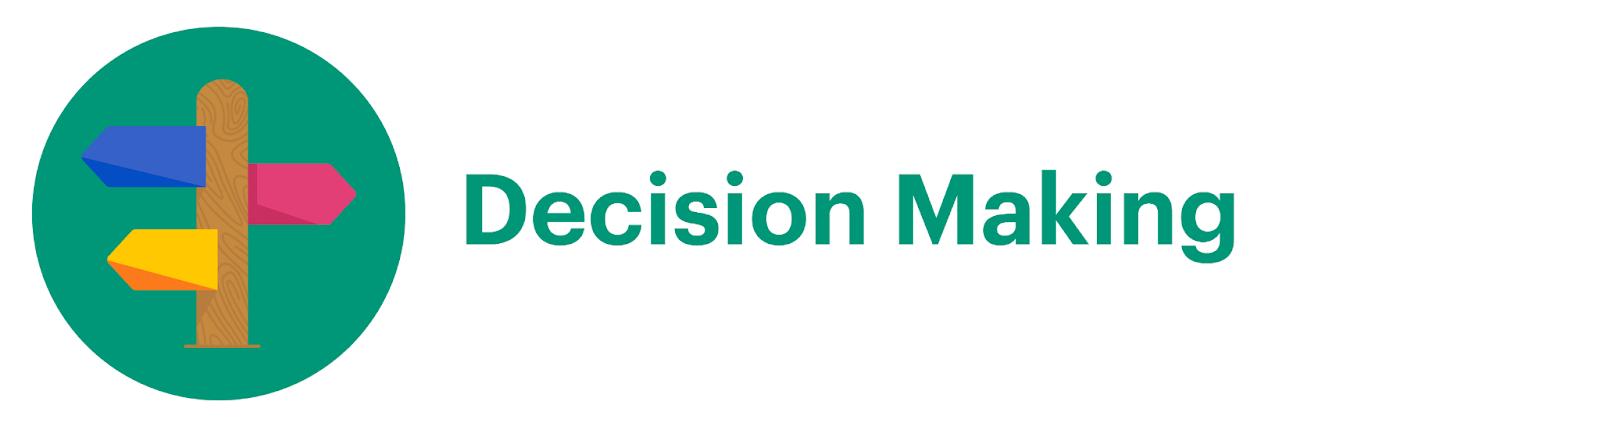 UCAT Decision Making (DM) icon.